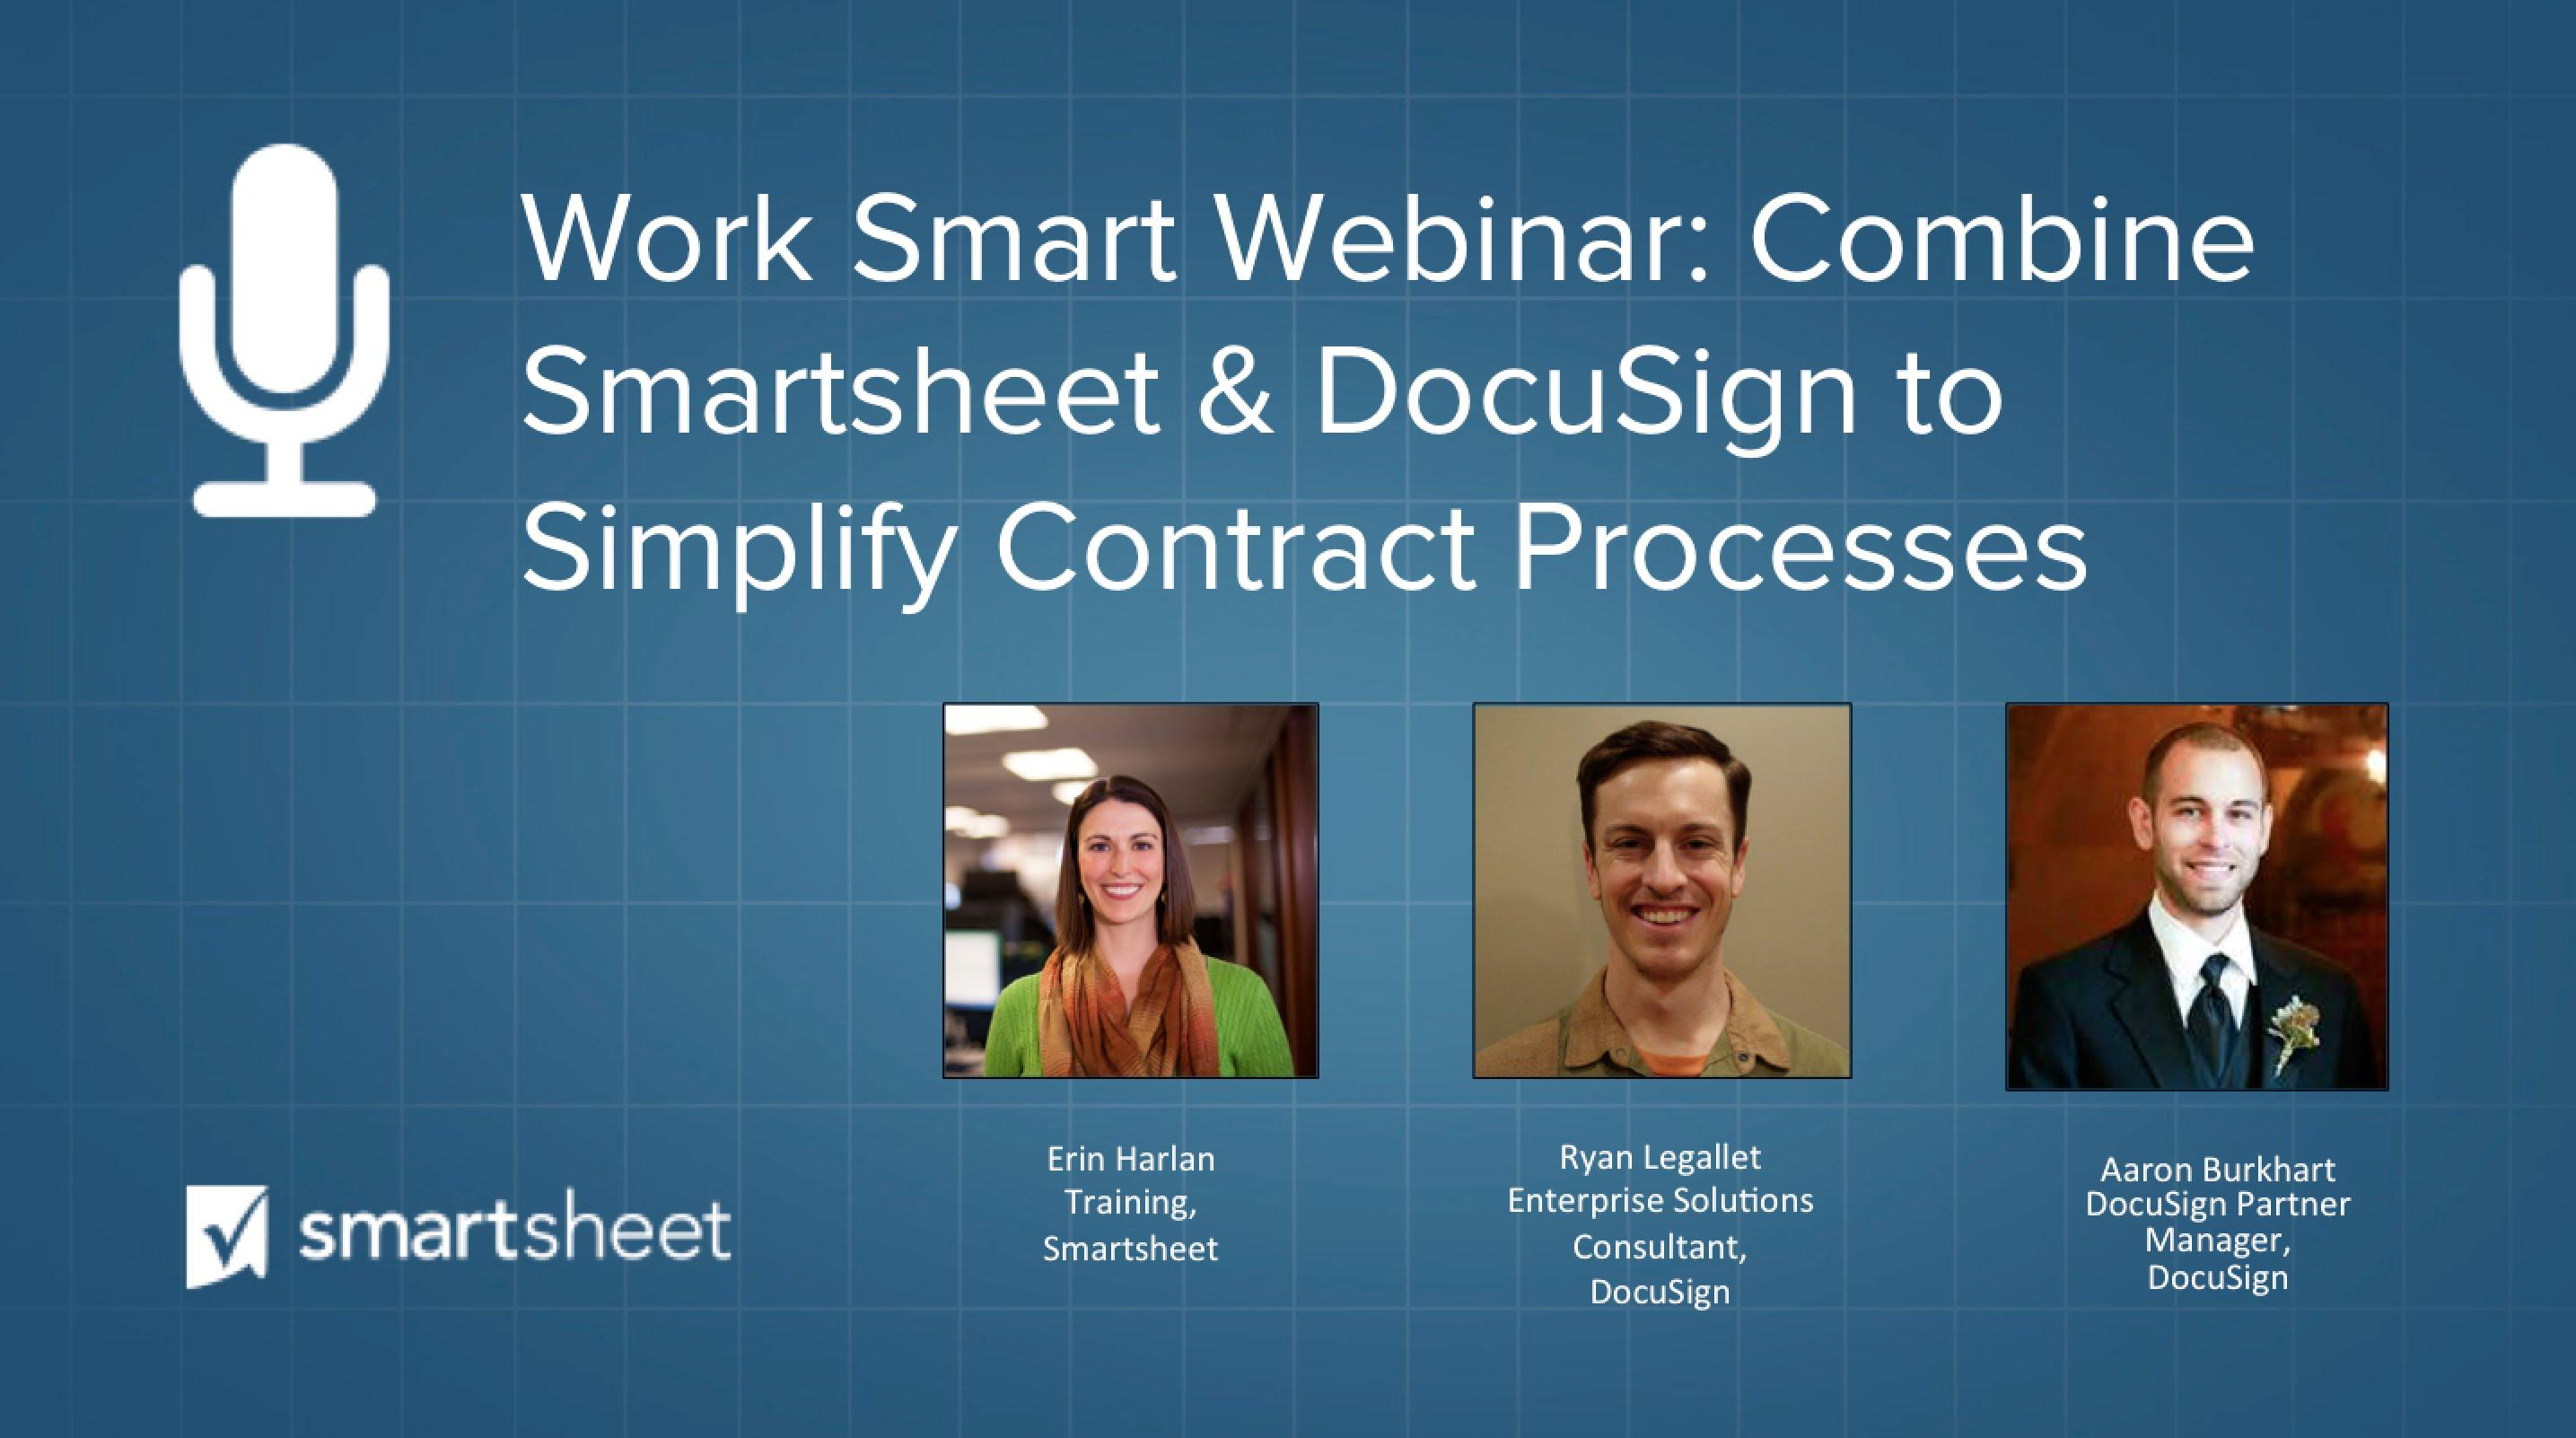 Combine Smartsheet and DocuSign to Simplify Contract Processes | Work Smart Webinar